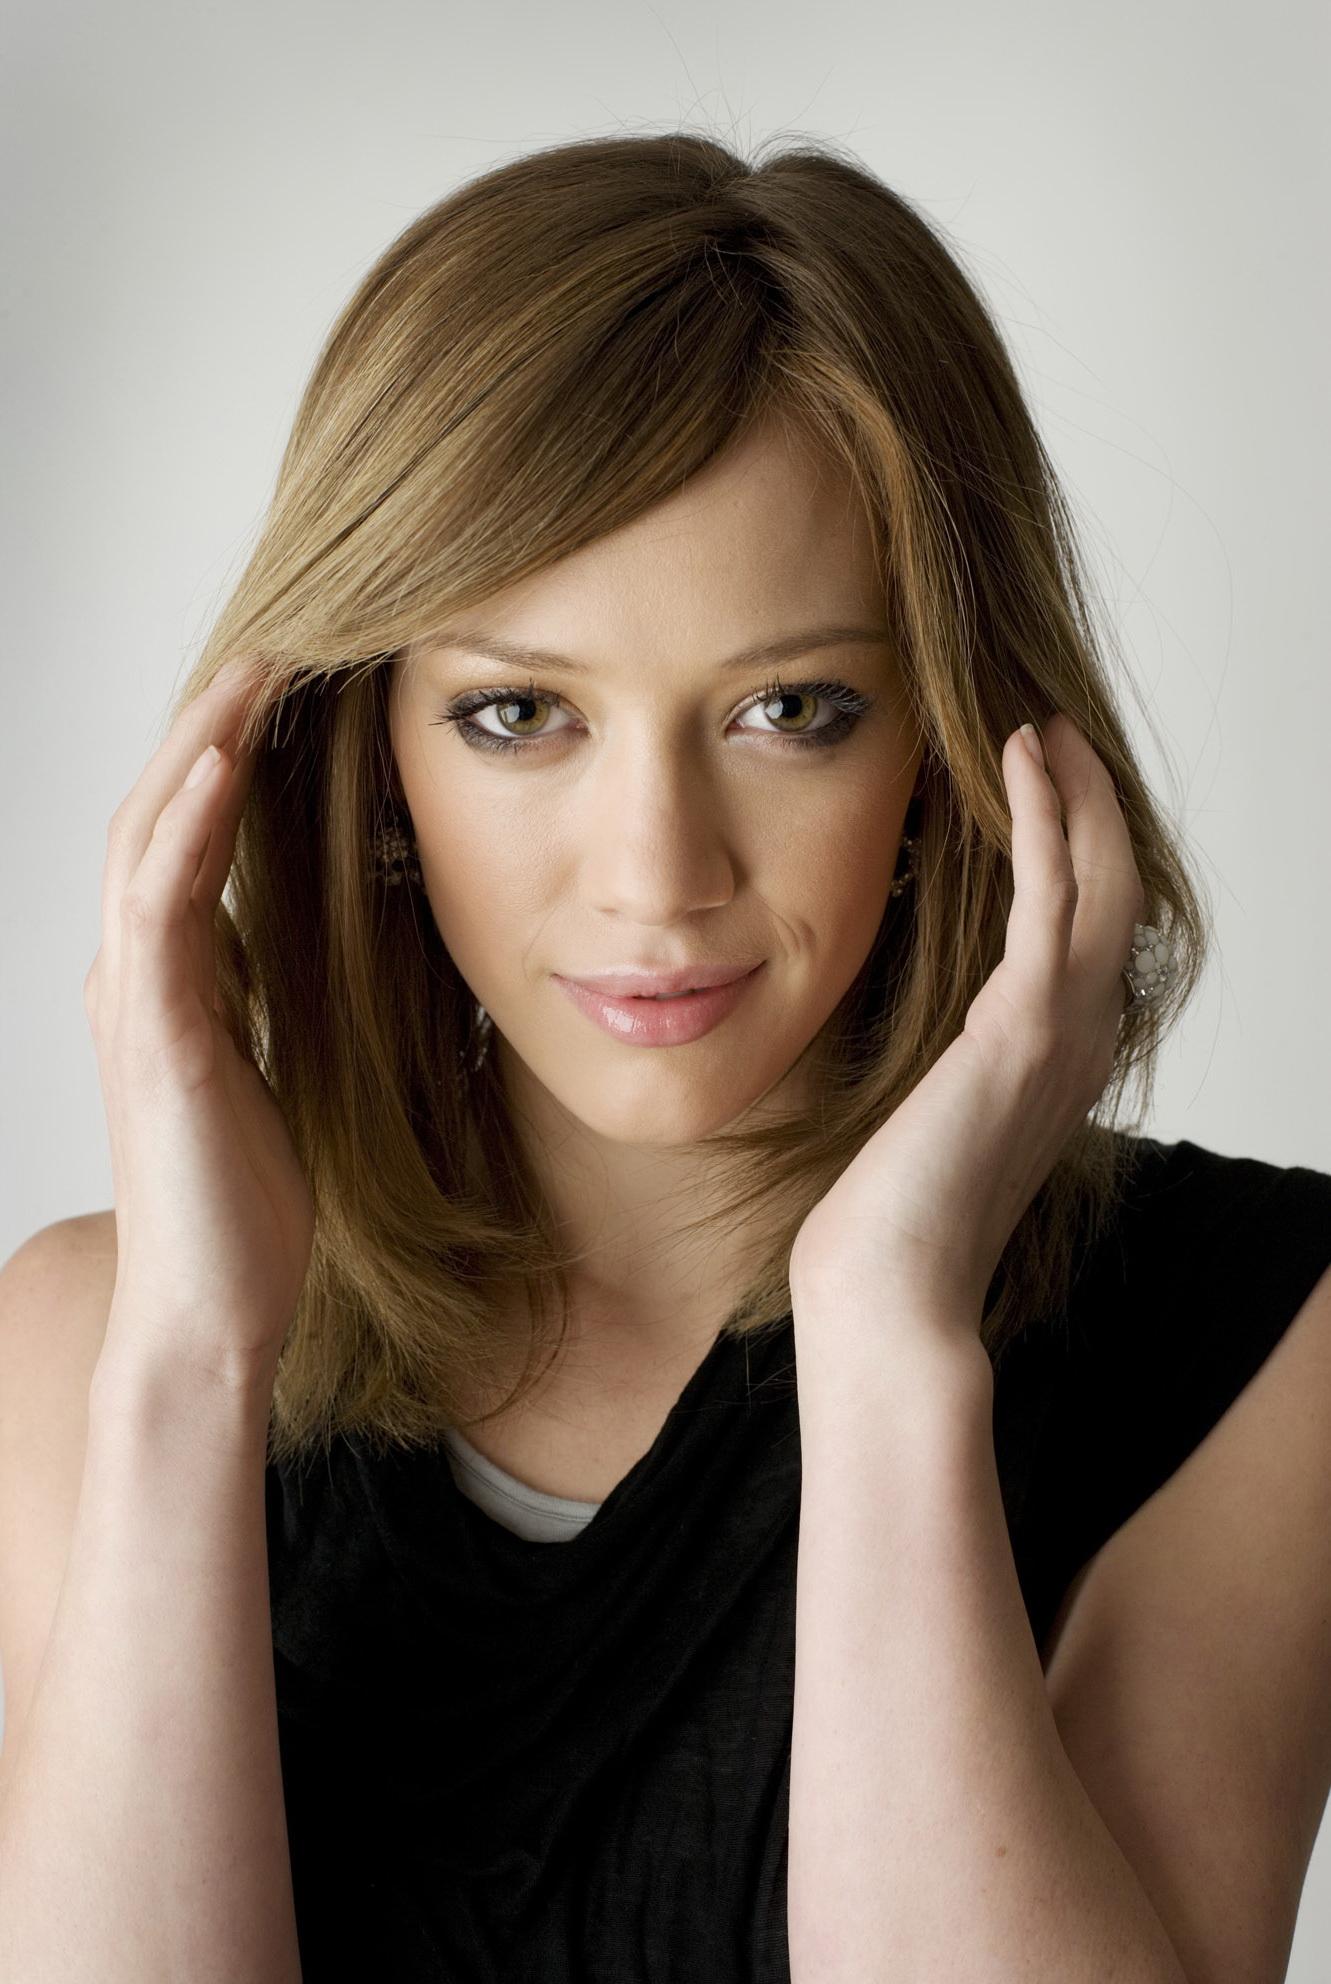 Хилари Дафф - Hilary Duff фото №142107 хилари дафф